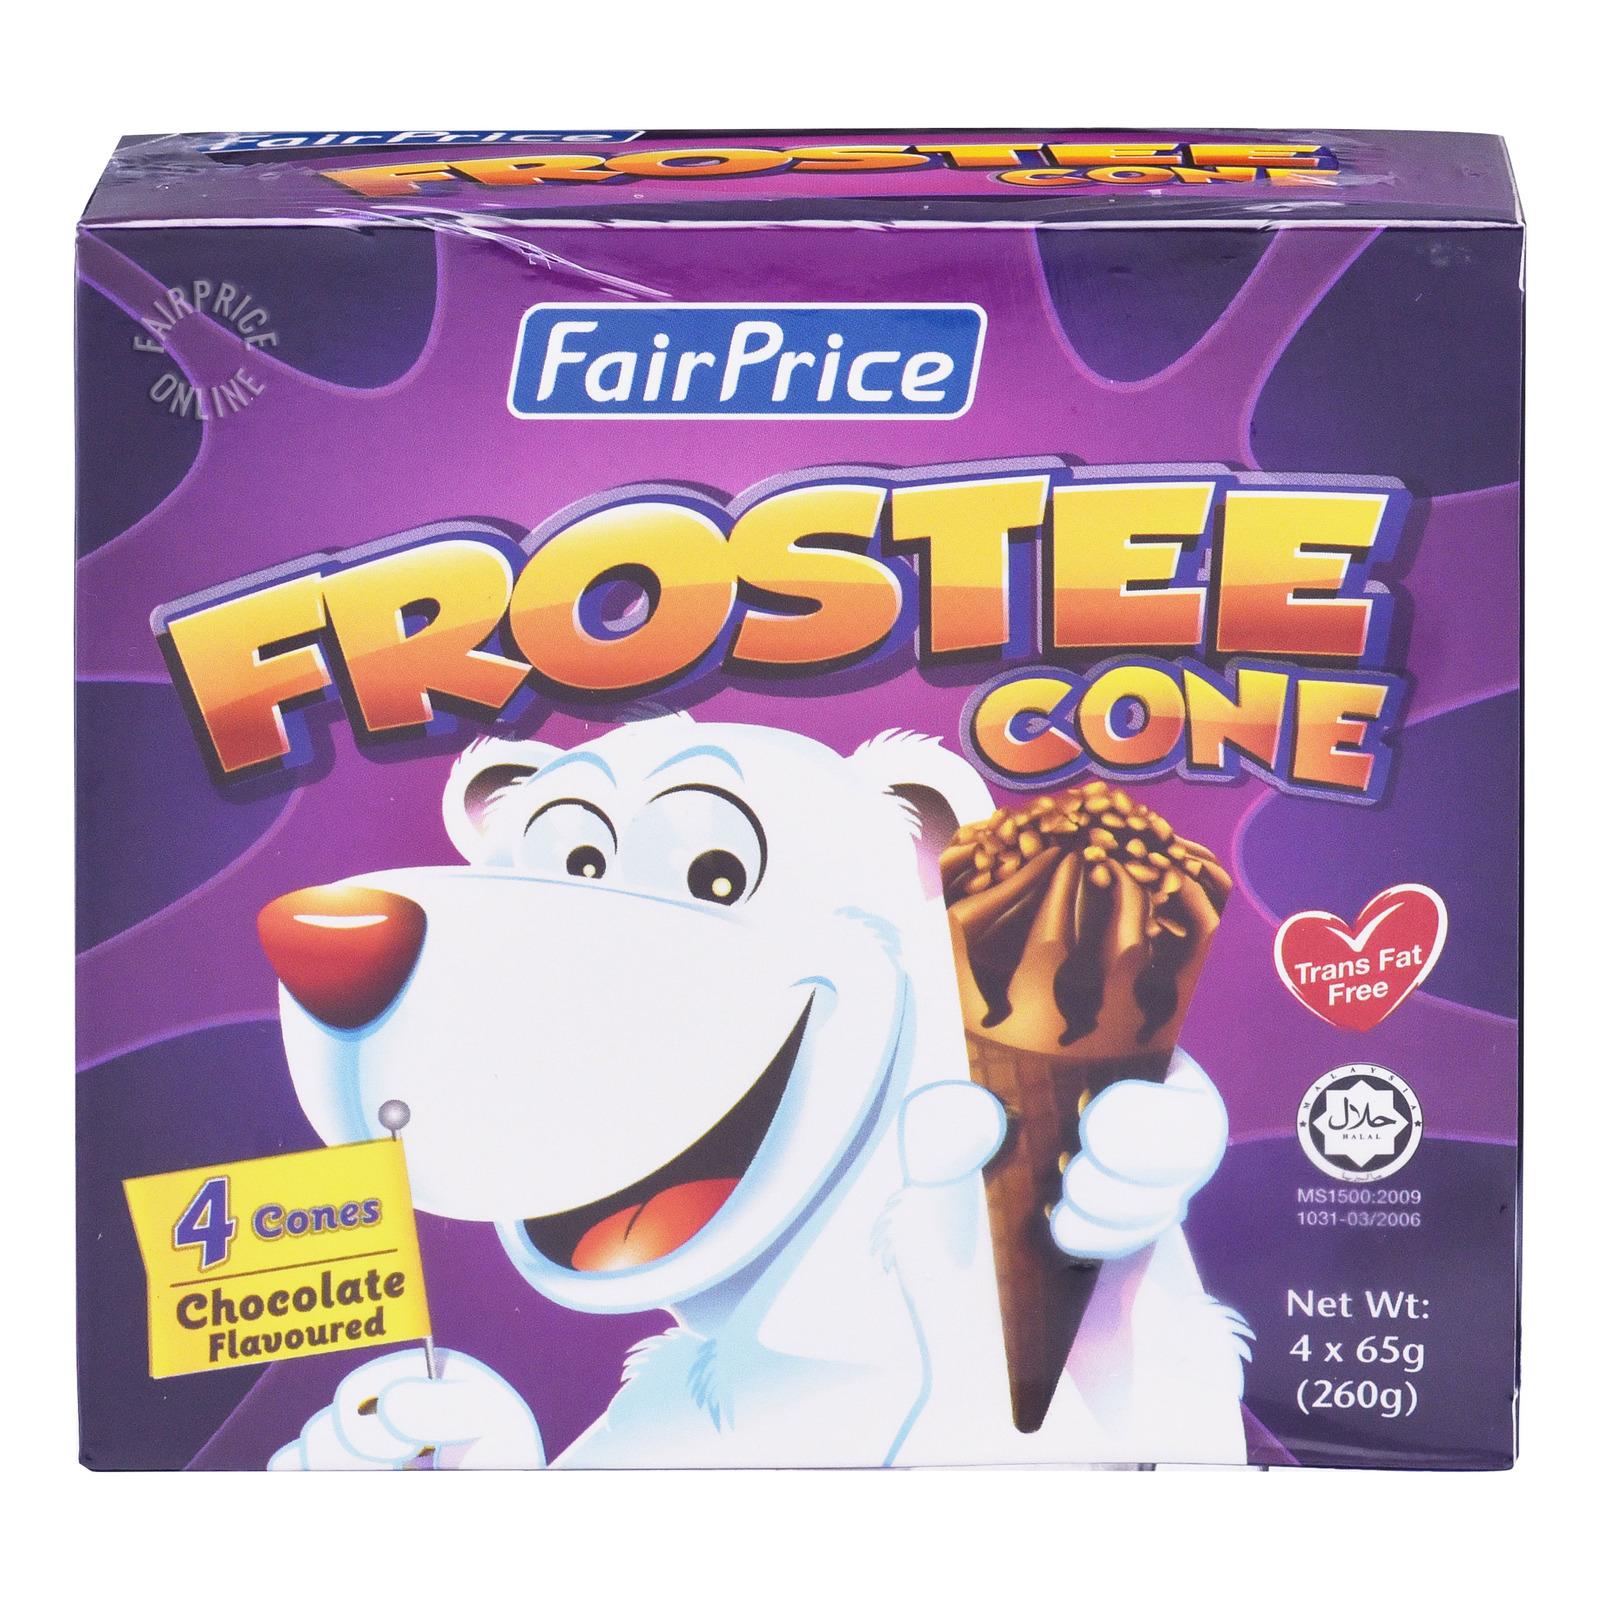 FairPrice Frostee Cone Ice Cream - Chocolate